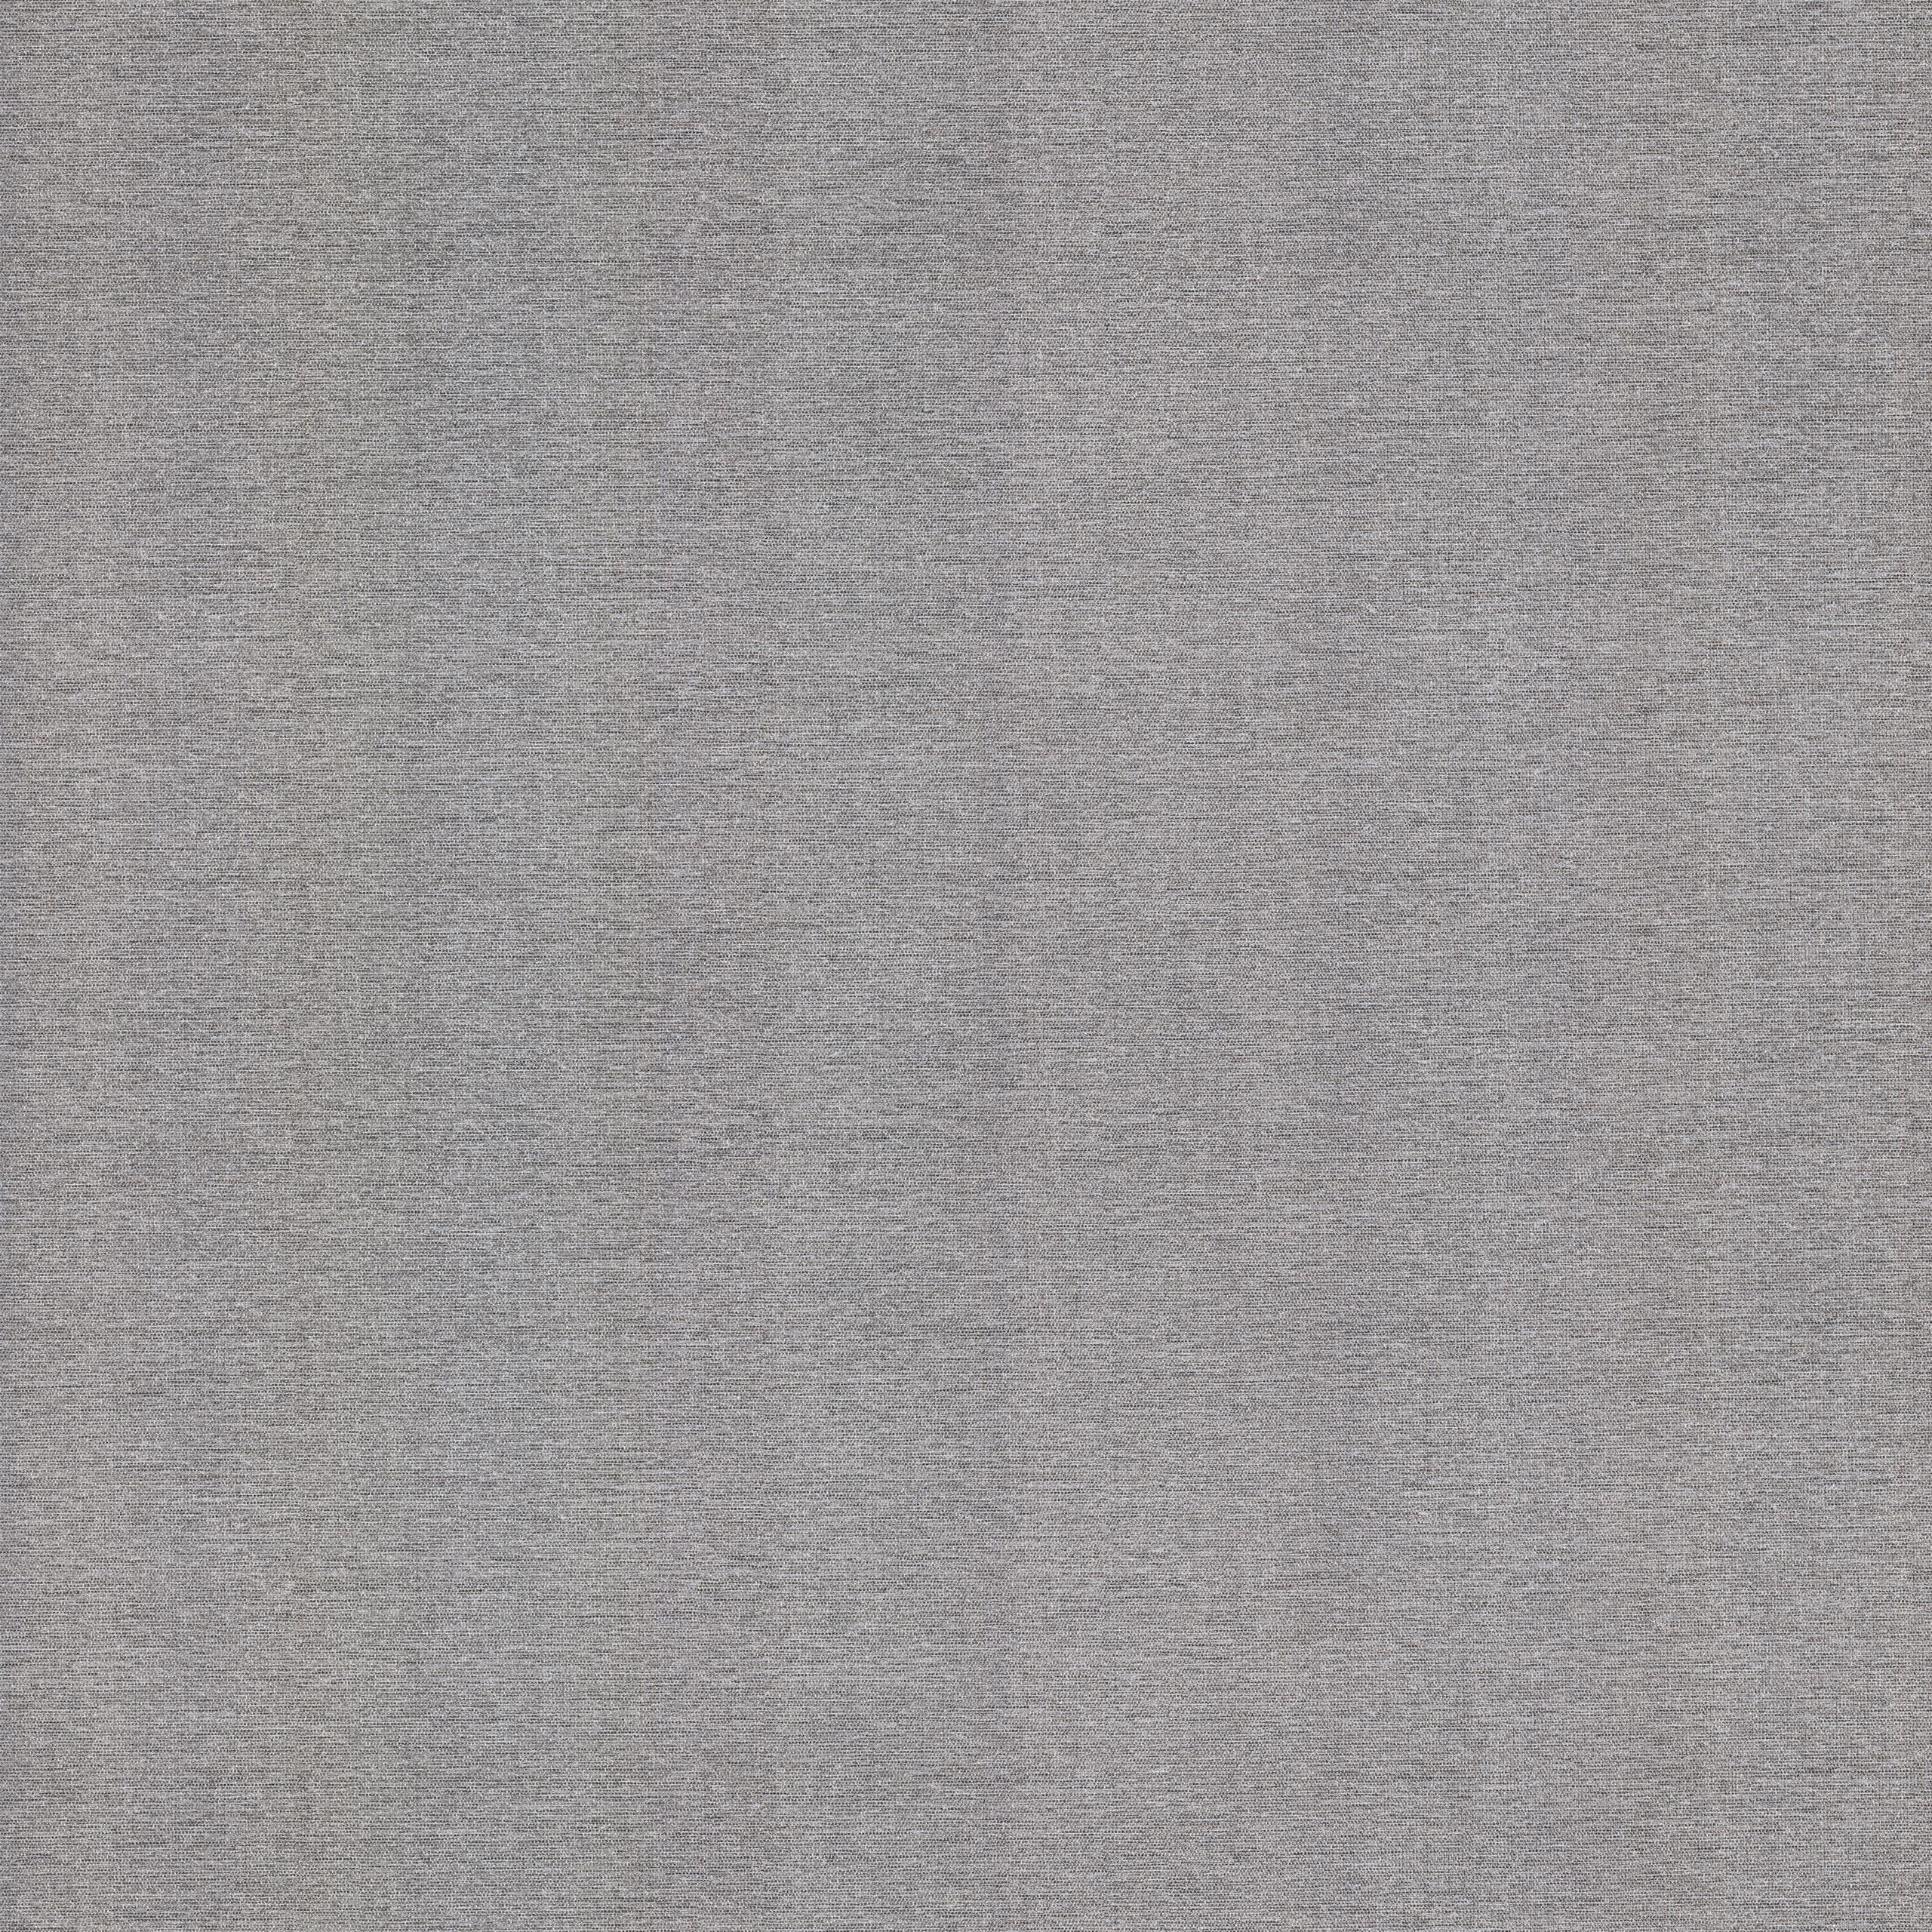 AL11 Silver Metal Weaving